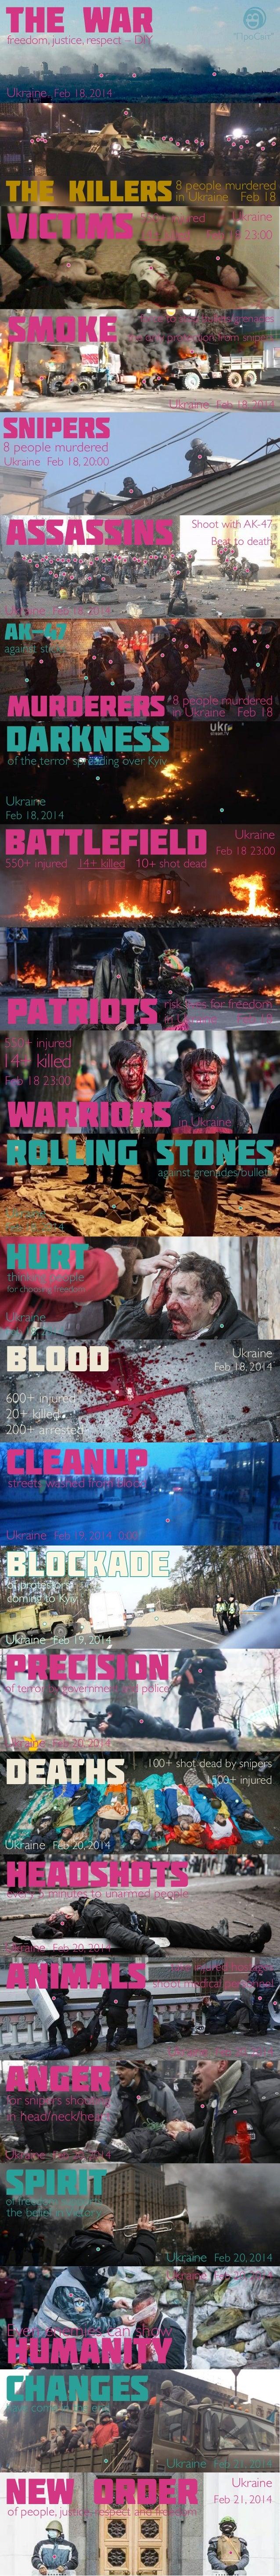 "The war  ""ПроCвіт""  freedom, justice, respect – DIY  Ukraine Feb 18, 2014  The Killers  victims smoke  8 people murdered i..."